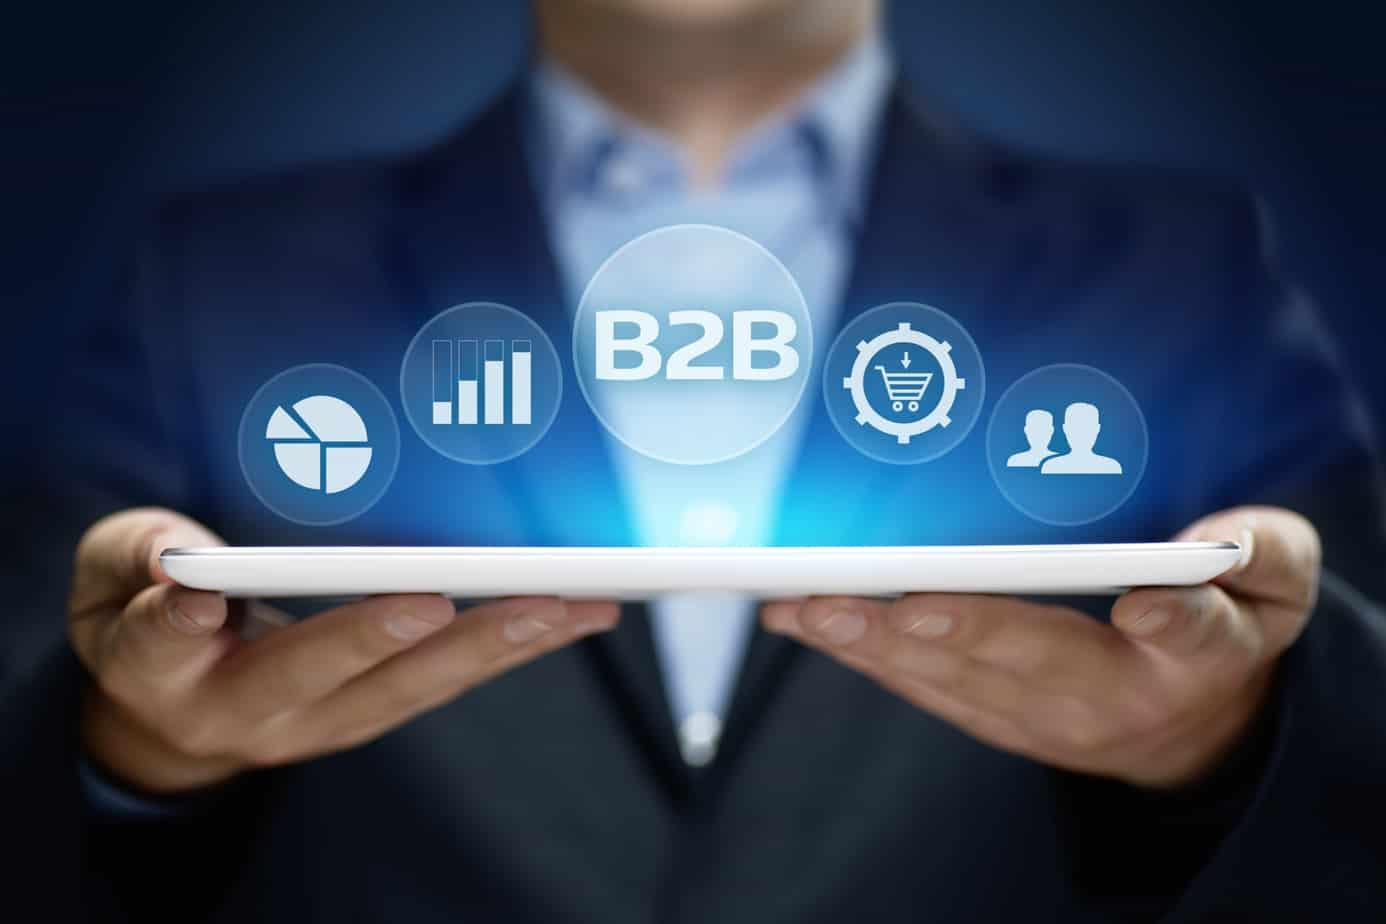 b2b-business-company-commerce-technology-marketing-concept-110681073